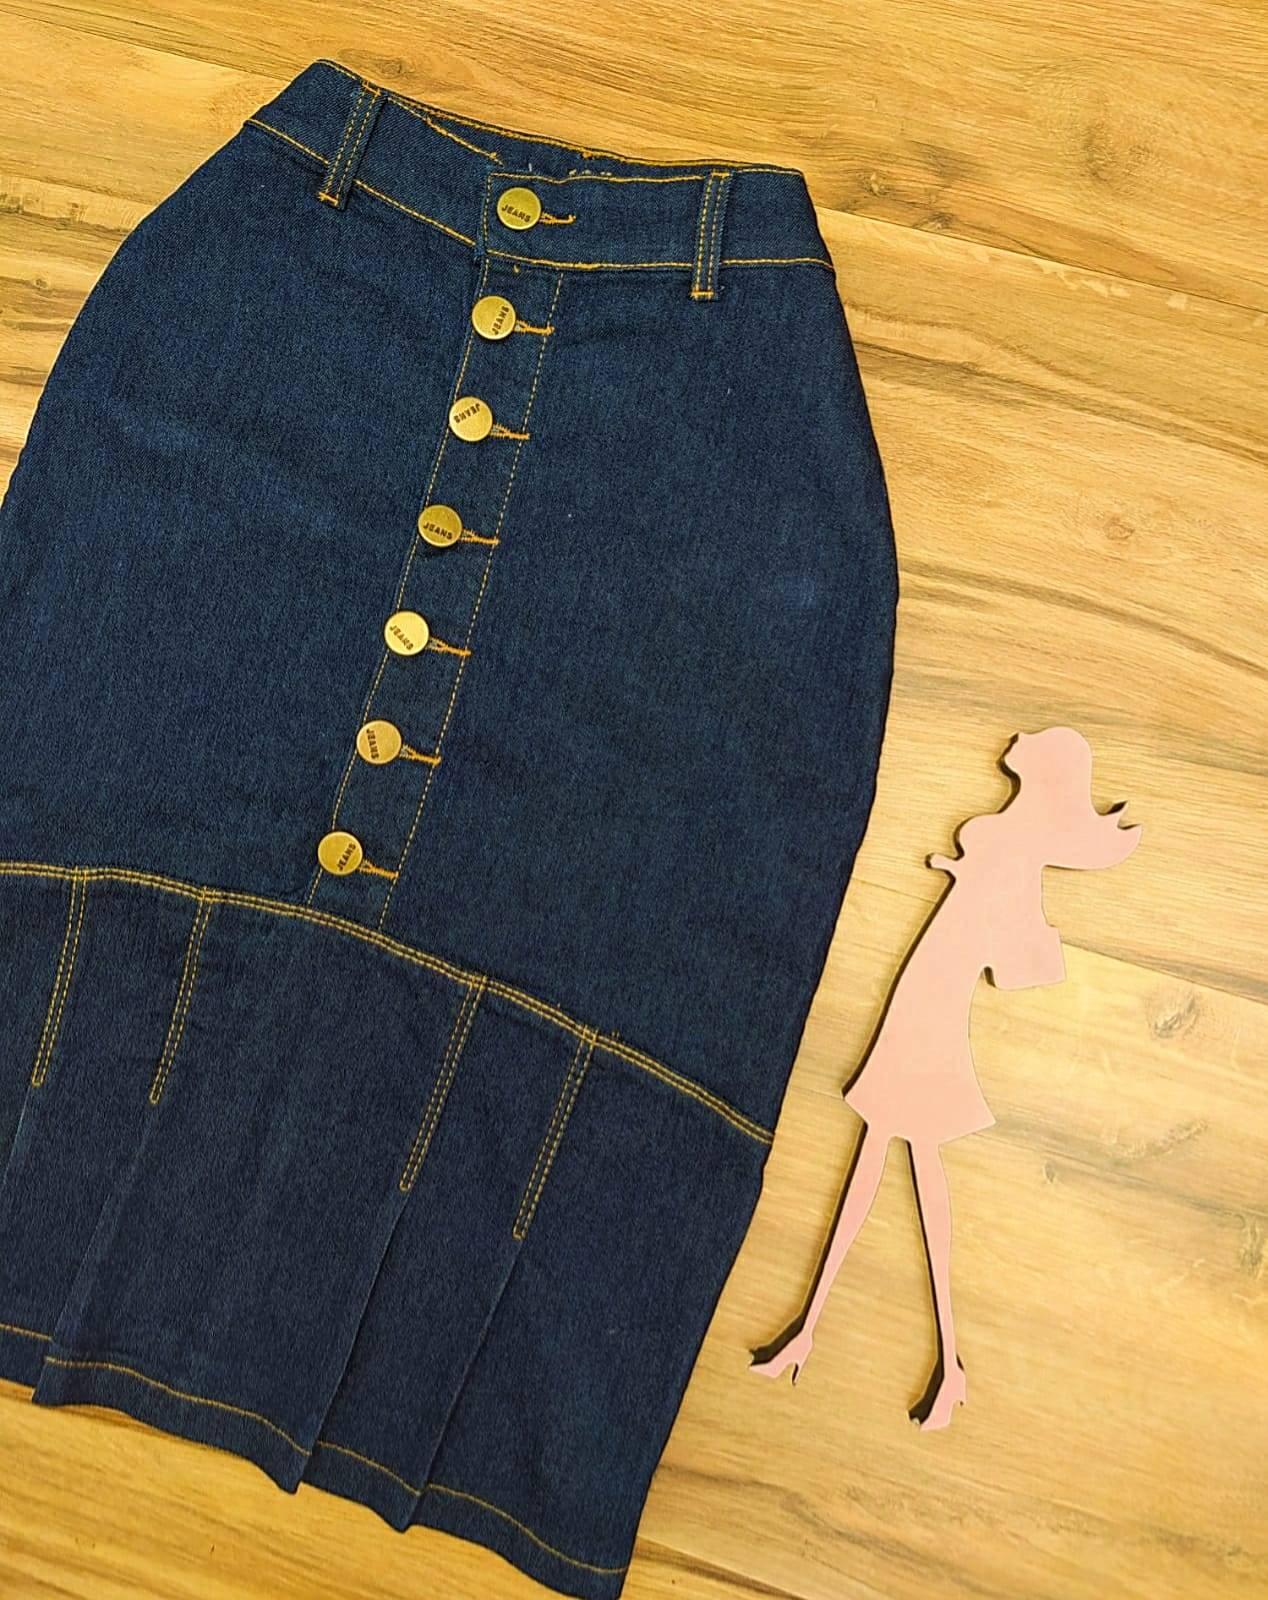 Saia Jeans Fernanda SAIA BELLA SB797185 - azul escuro